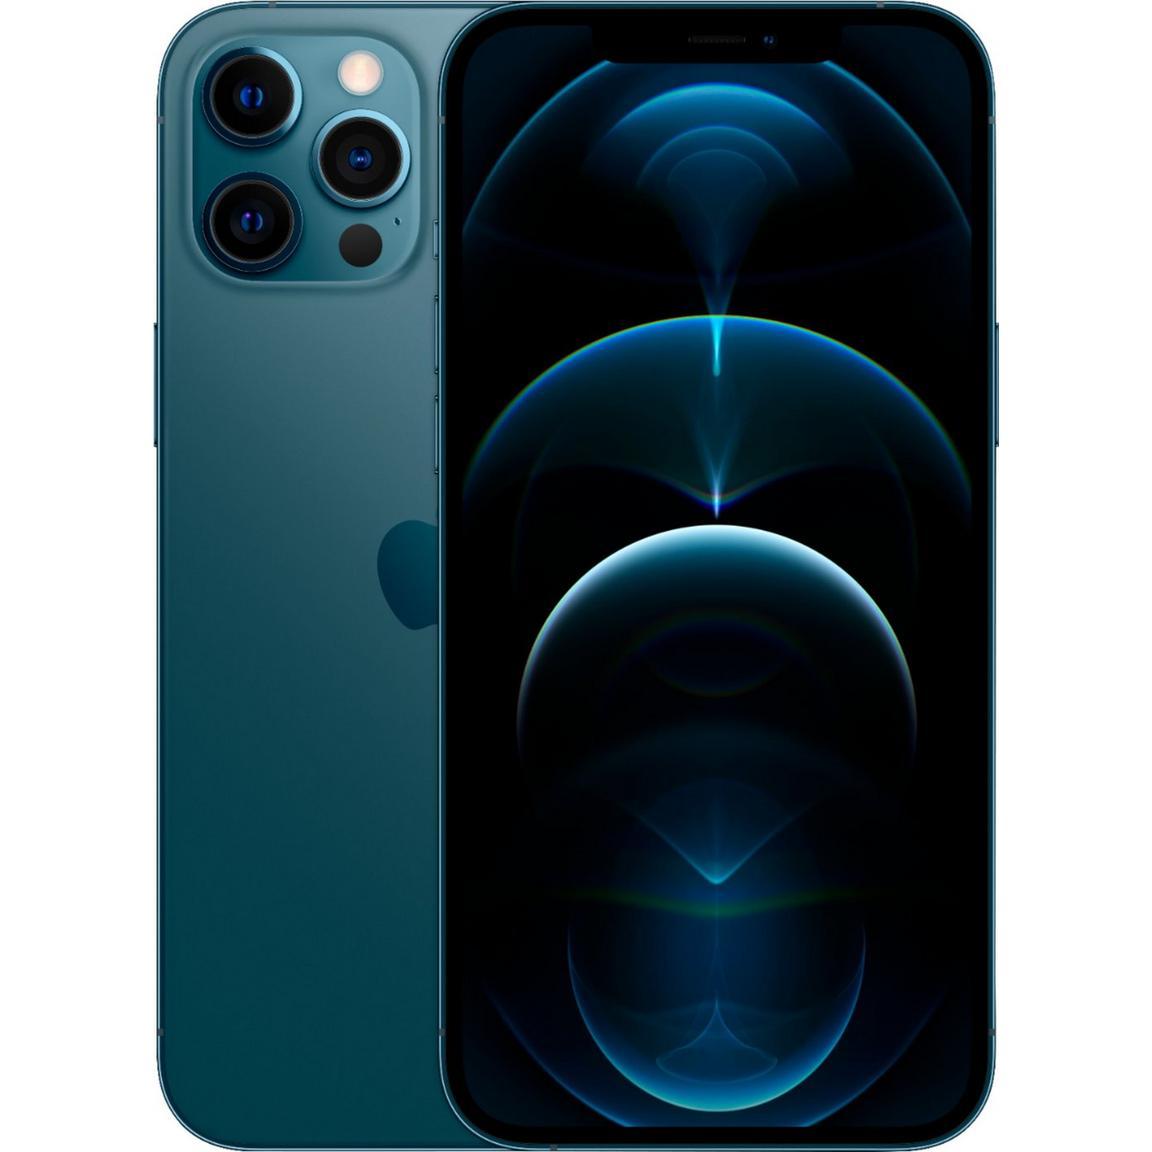 iPhone 12 Pro Max 256GB - ATT